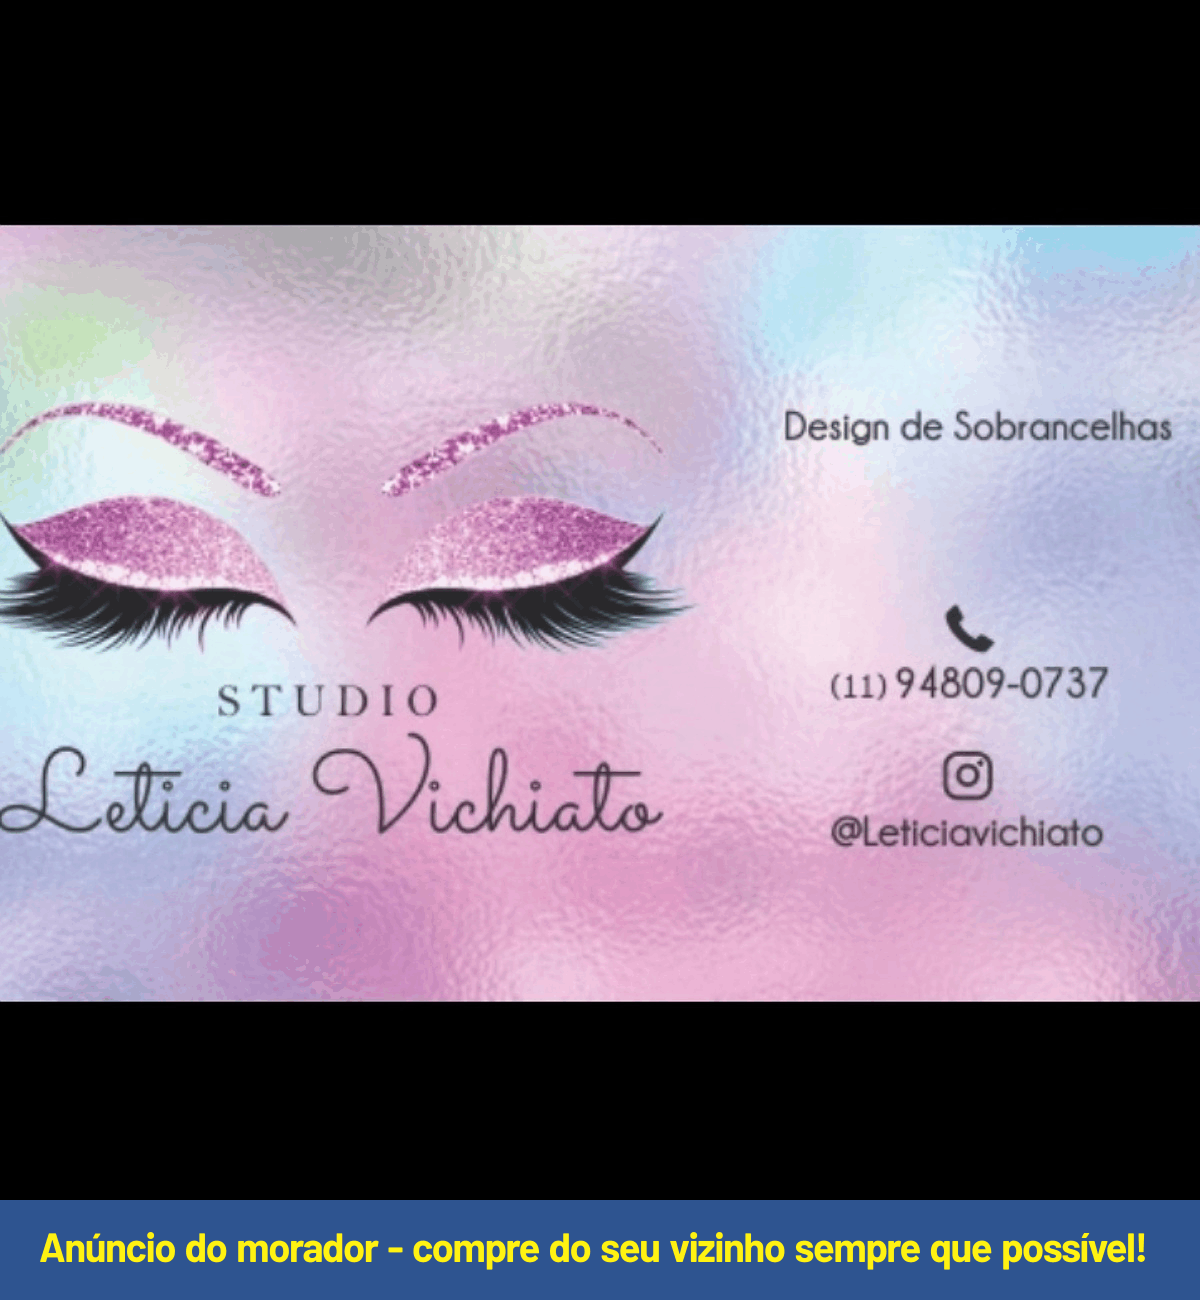 DESIGN DE SOBRANCELHAS - Leticia Vichiat